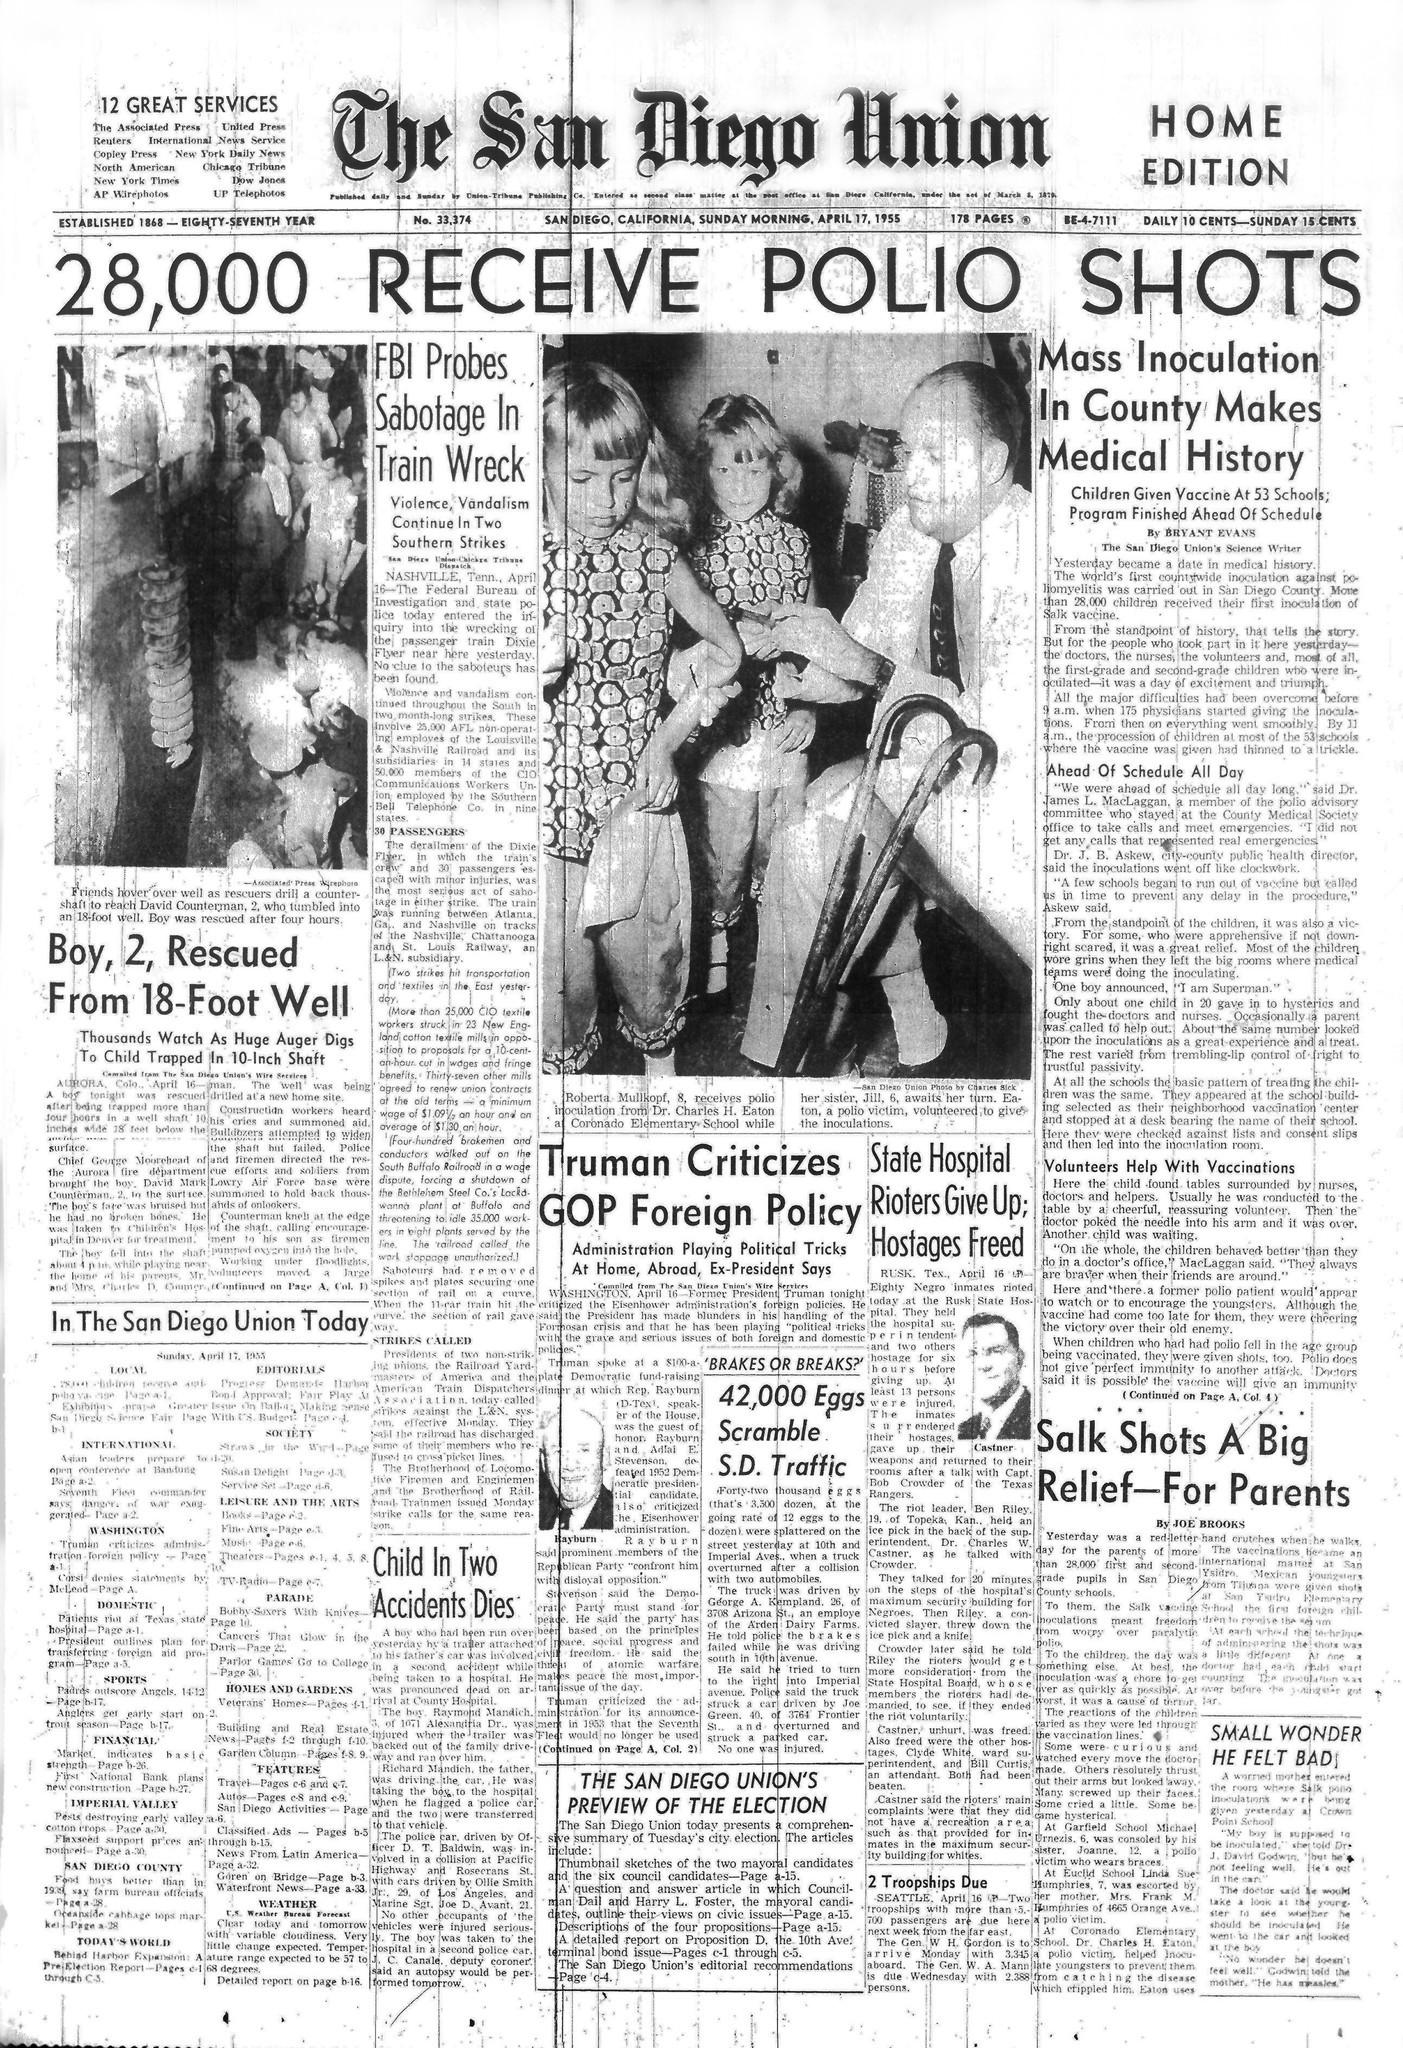 April 17, 1955